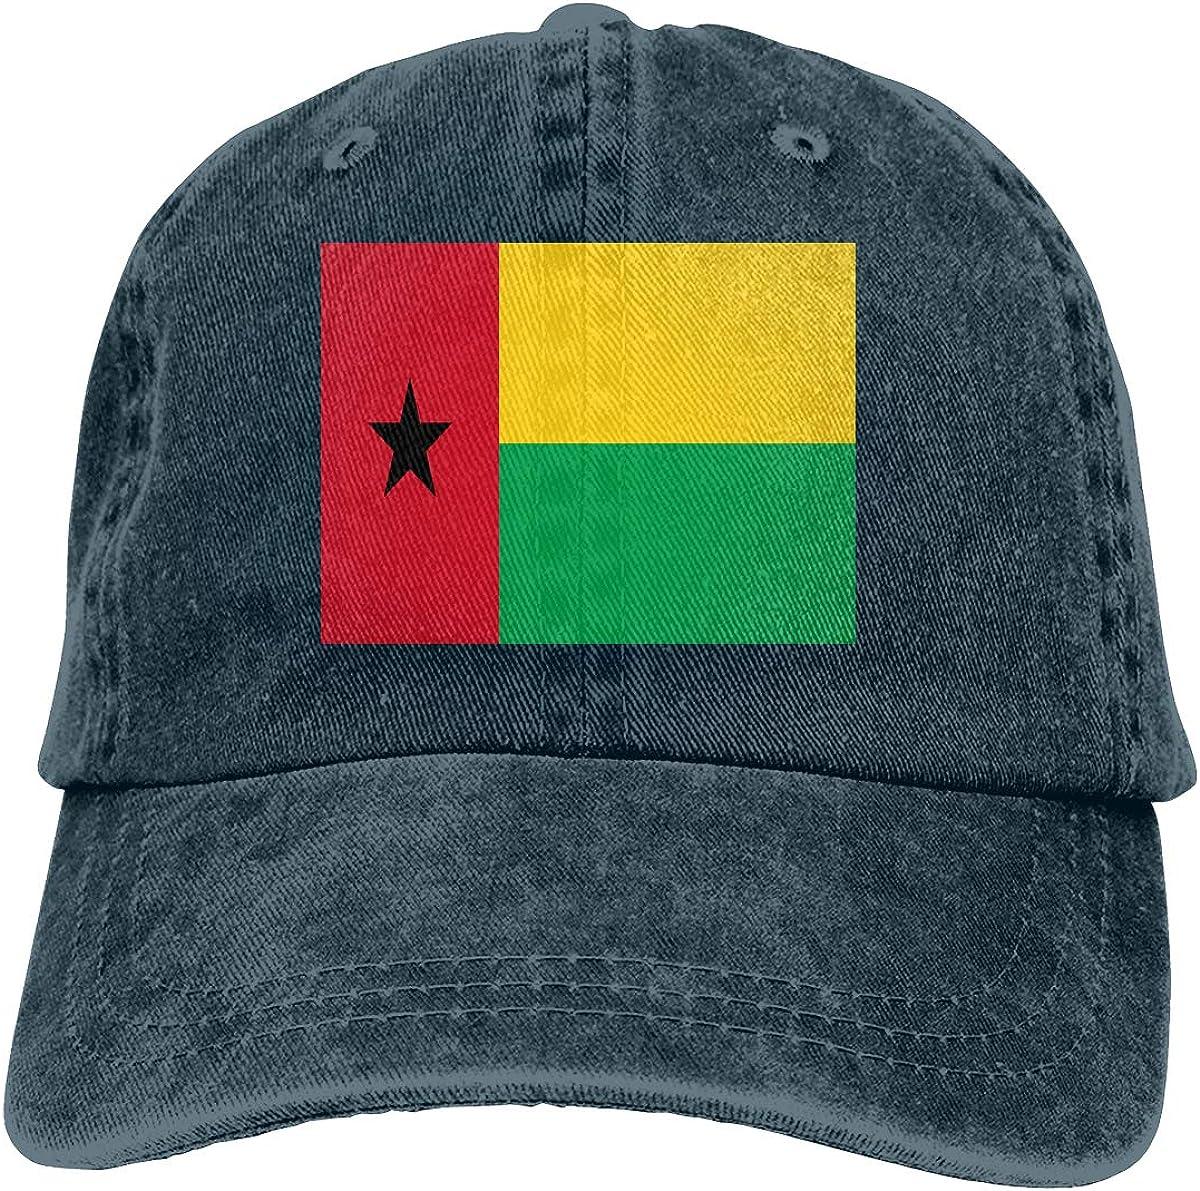 Flag Guinea-Bissau Denim Hat Adjustable Plain Cap Baseball Caps